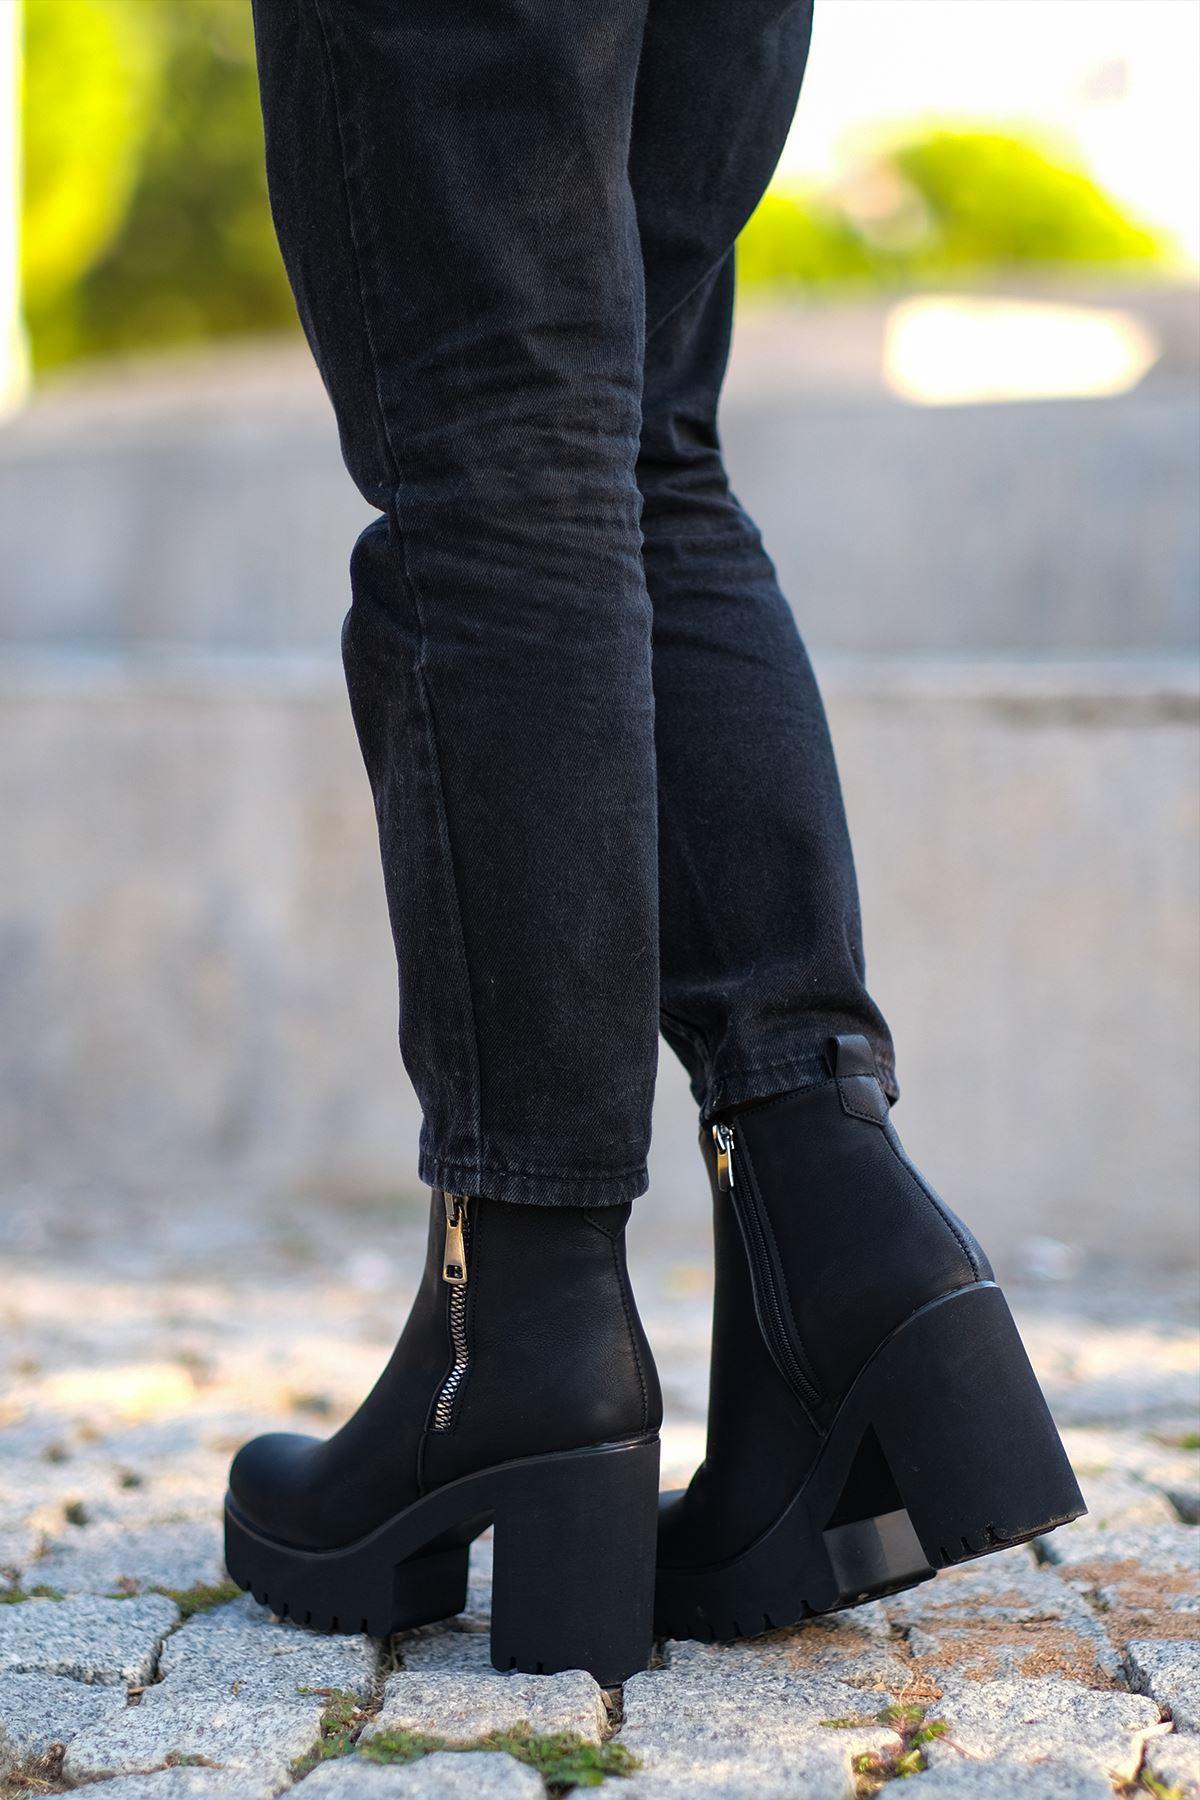 Arlen Mat Deri Fermuar Detaylı Kalın Topuklu Bot Siyah